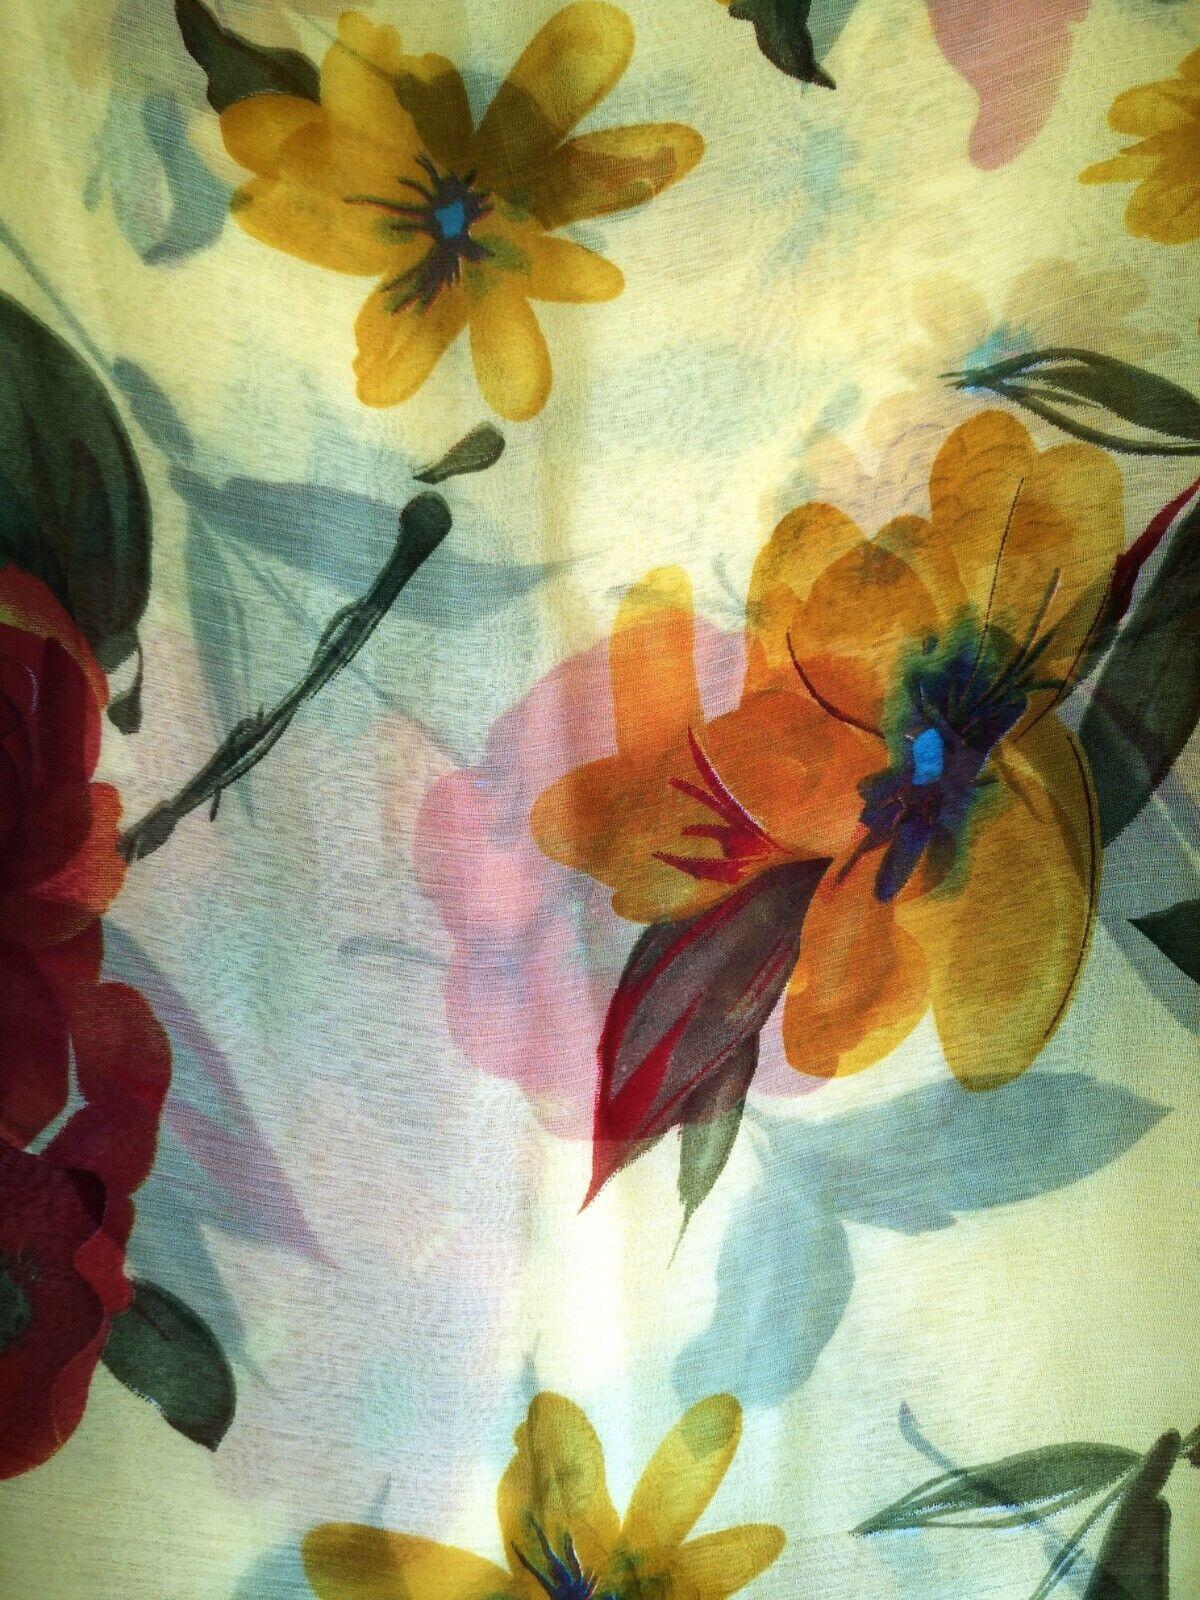 Chiffon saree with beautiful floral print